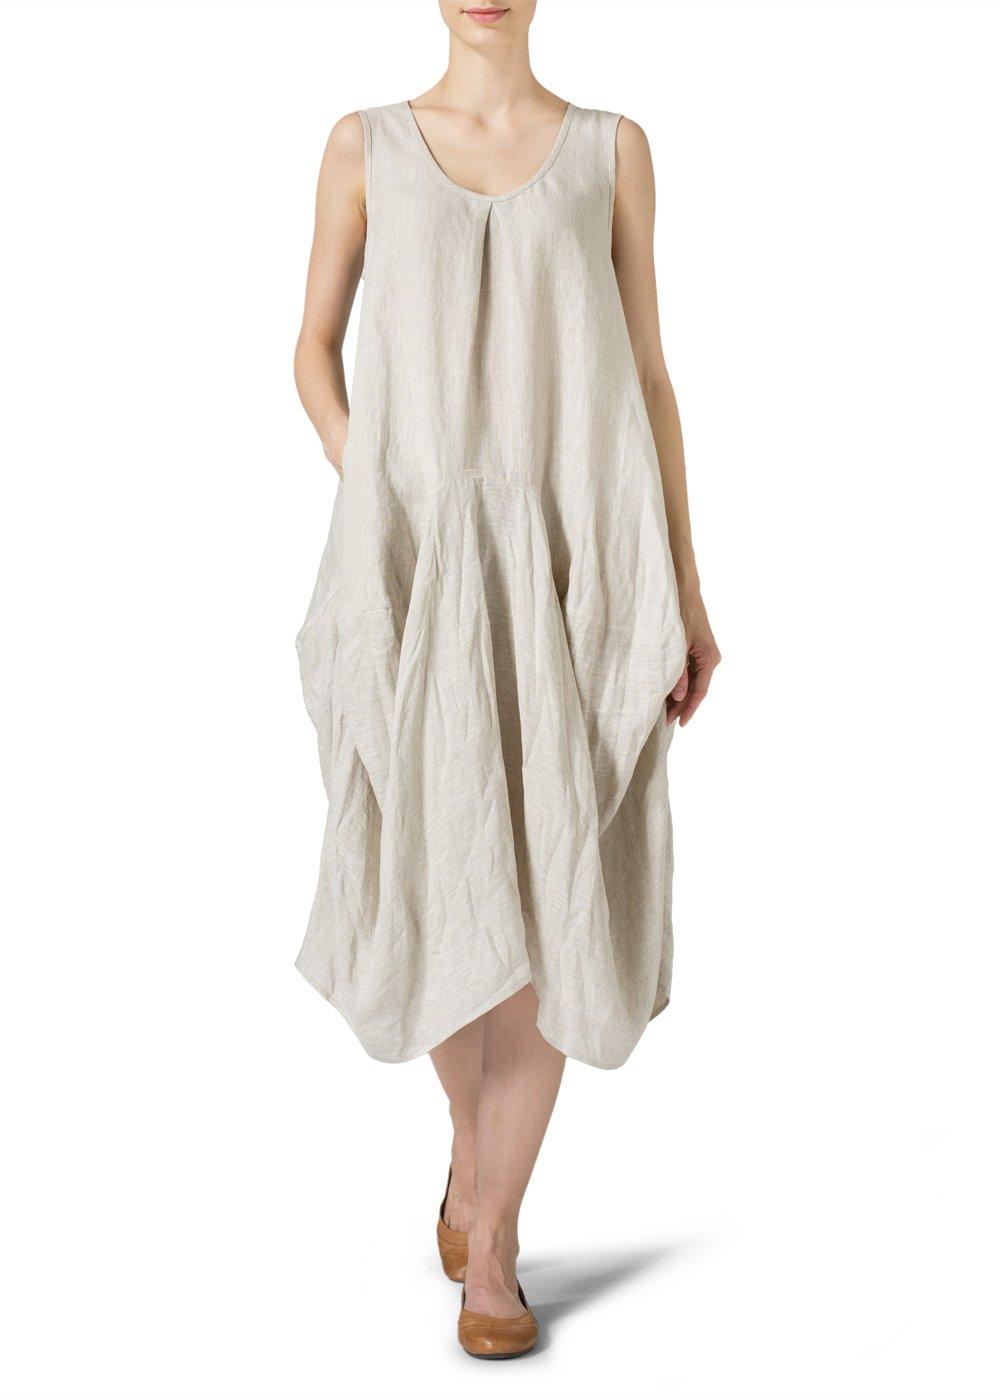 Vivid Linen Sleeveless Draped Dress-1X-Oat